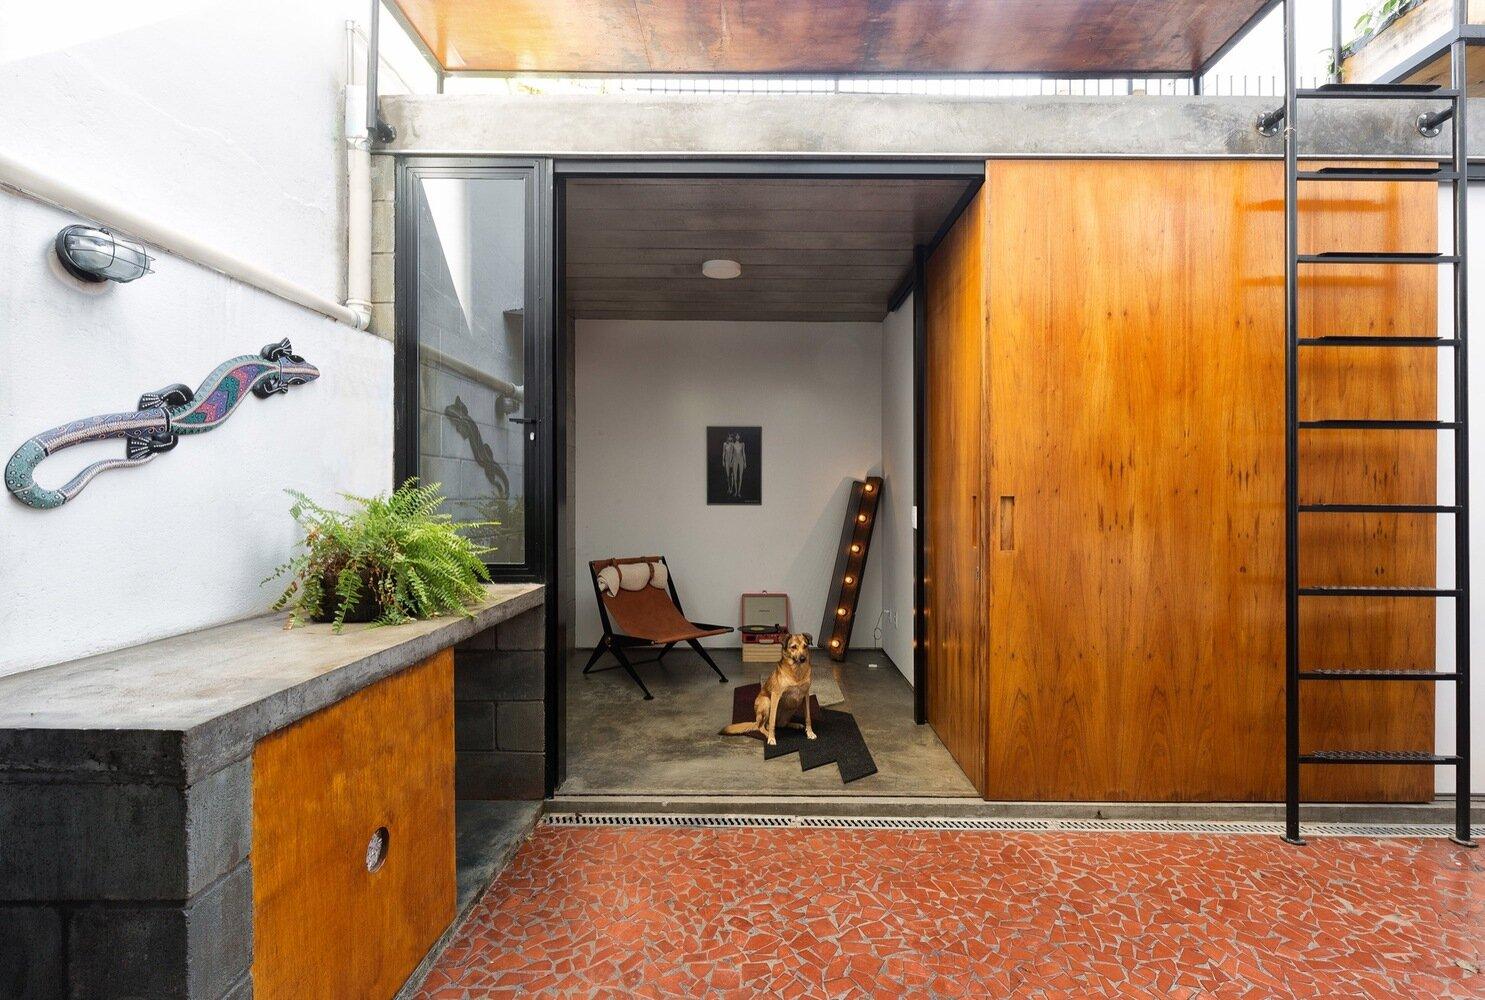 Puxadinho VAGA Brasil Exterior Humble Homes